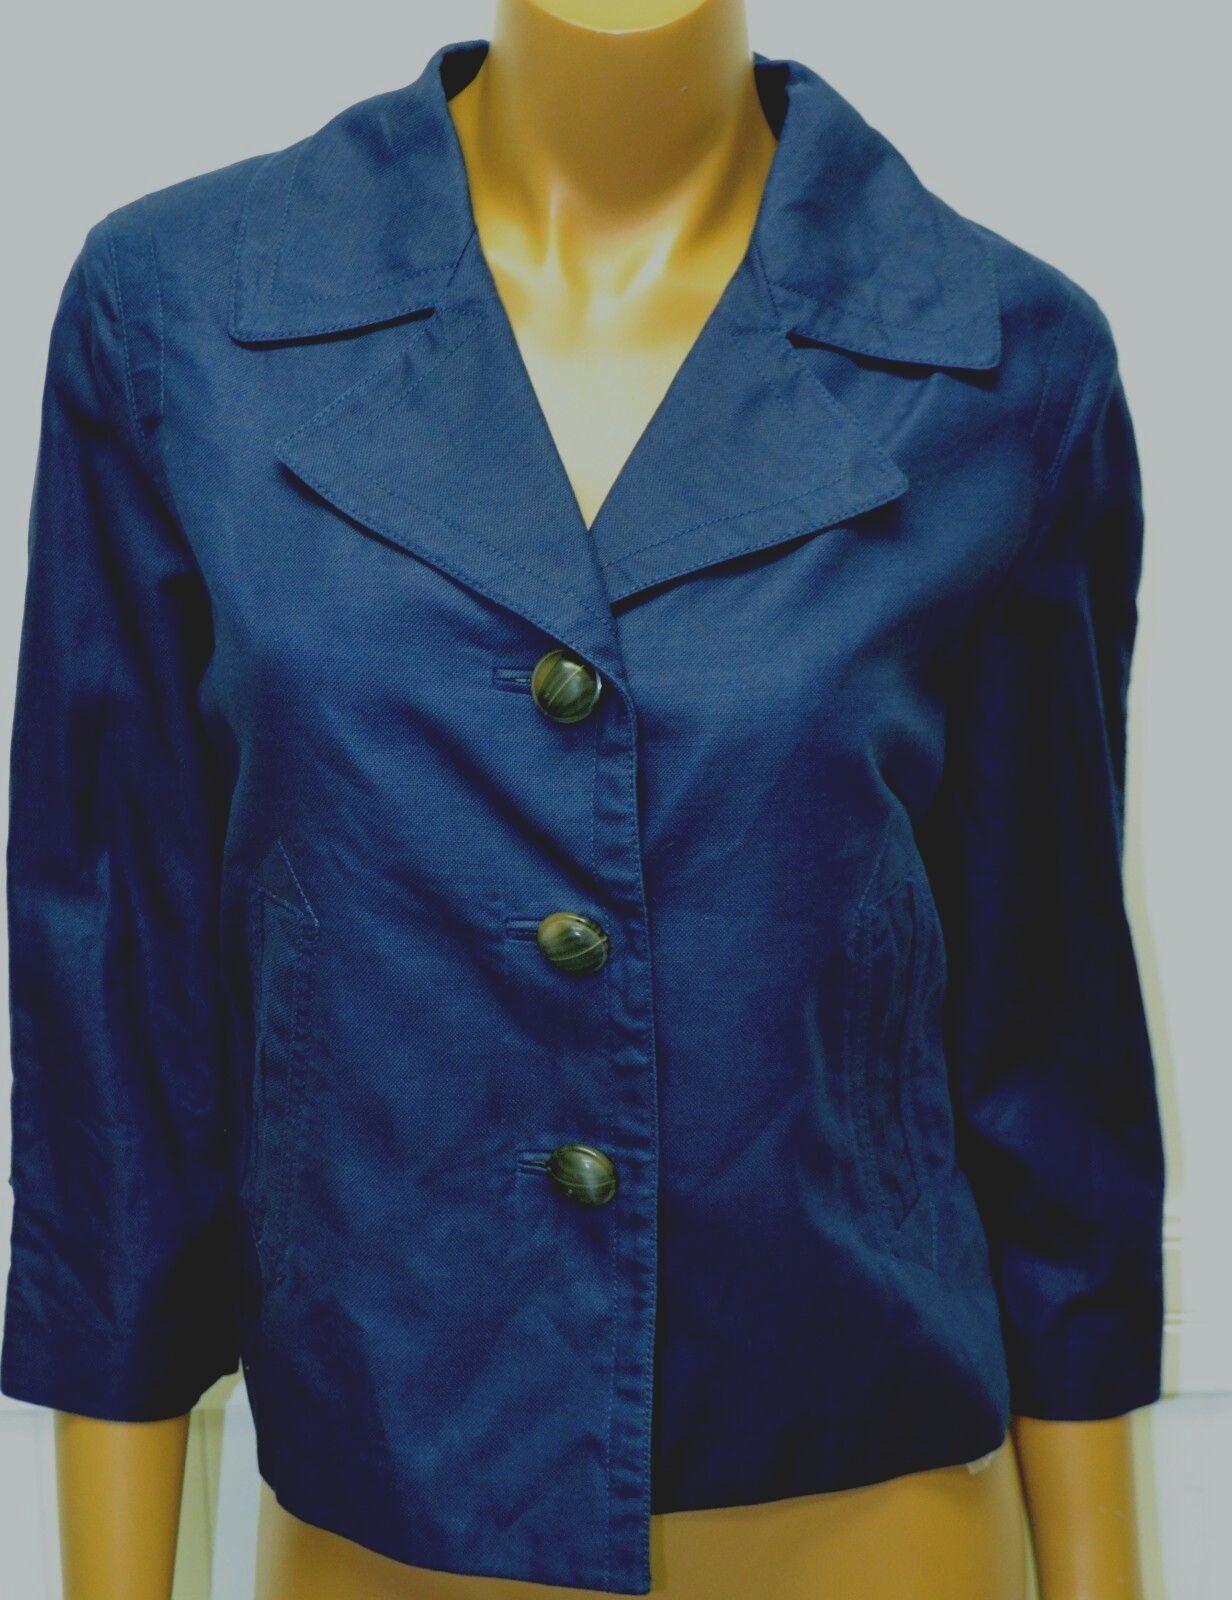 2 Talbots Petite Größe Neu 159 Leinen Mantel Blazer Jacke